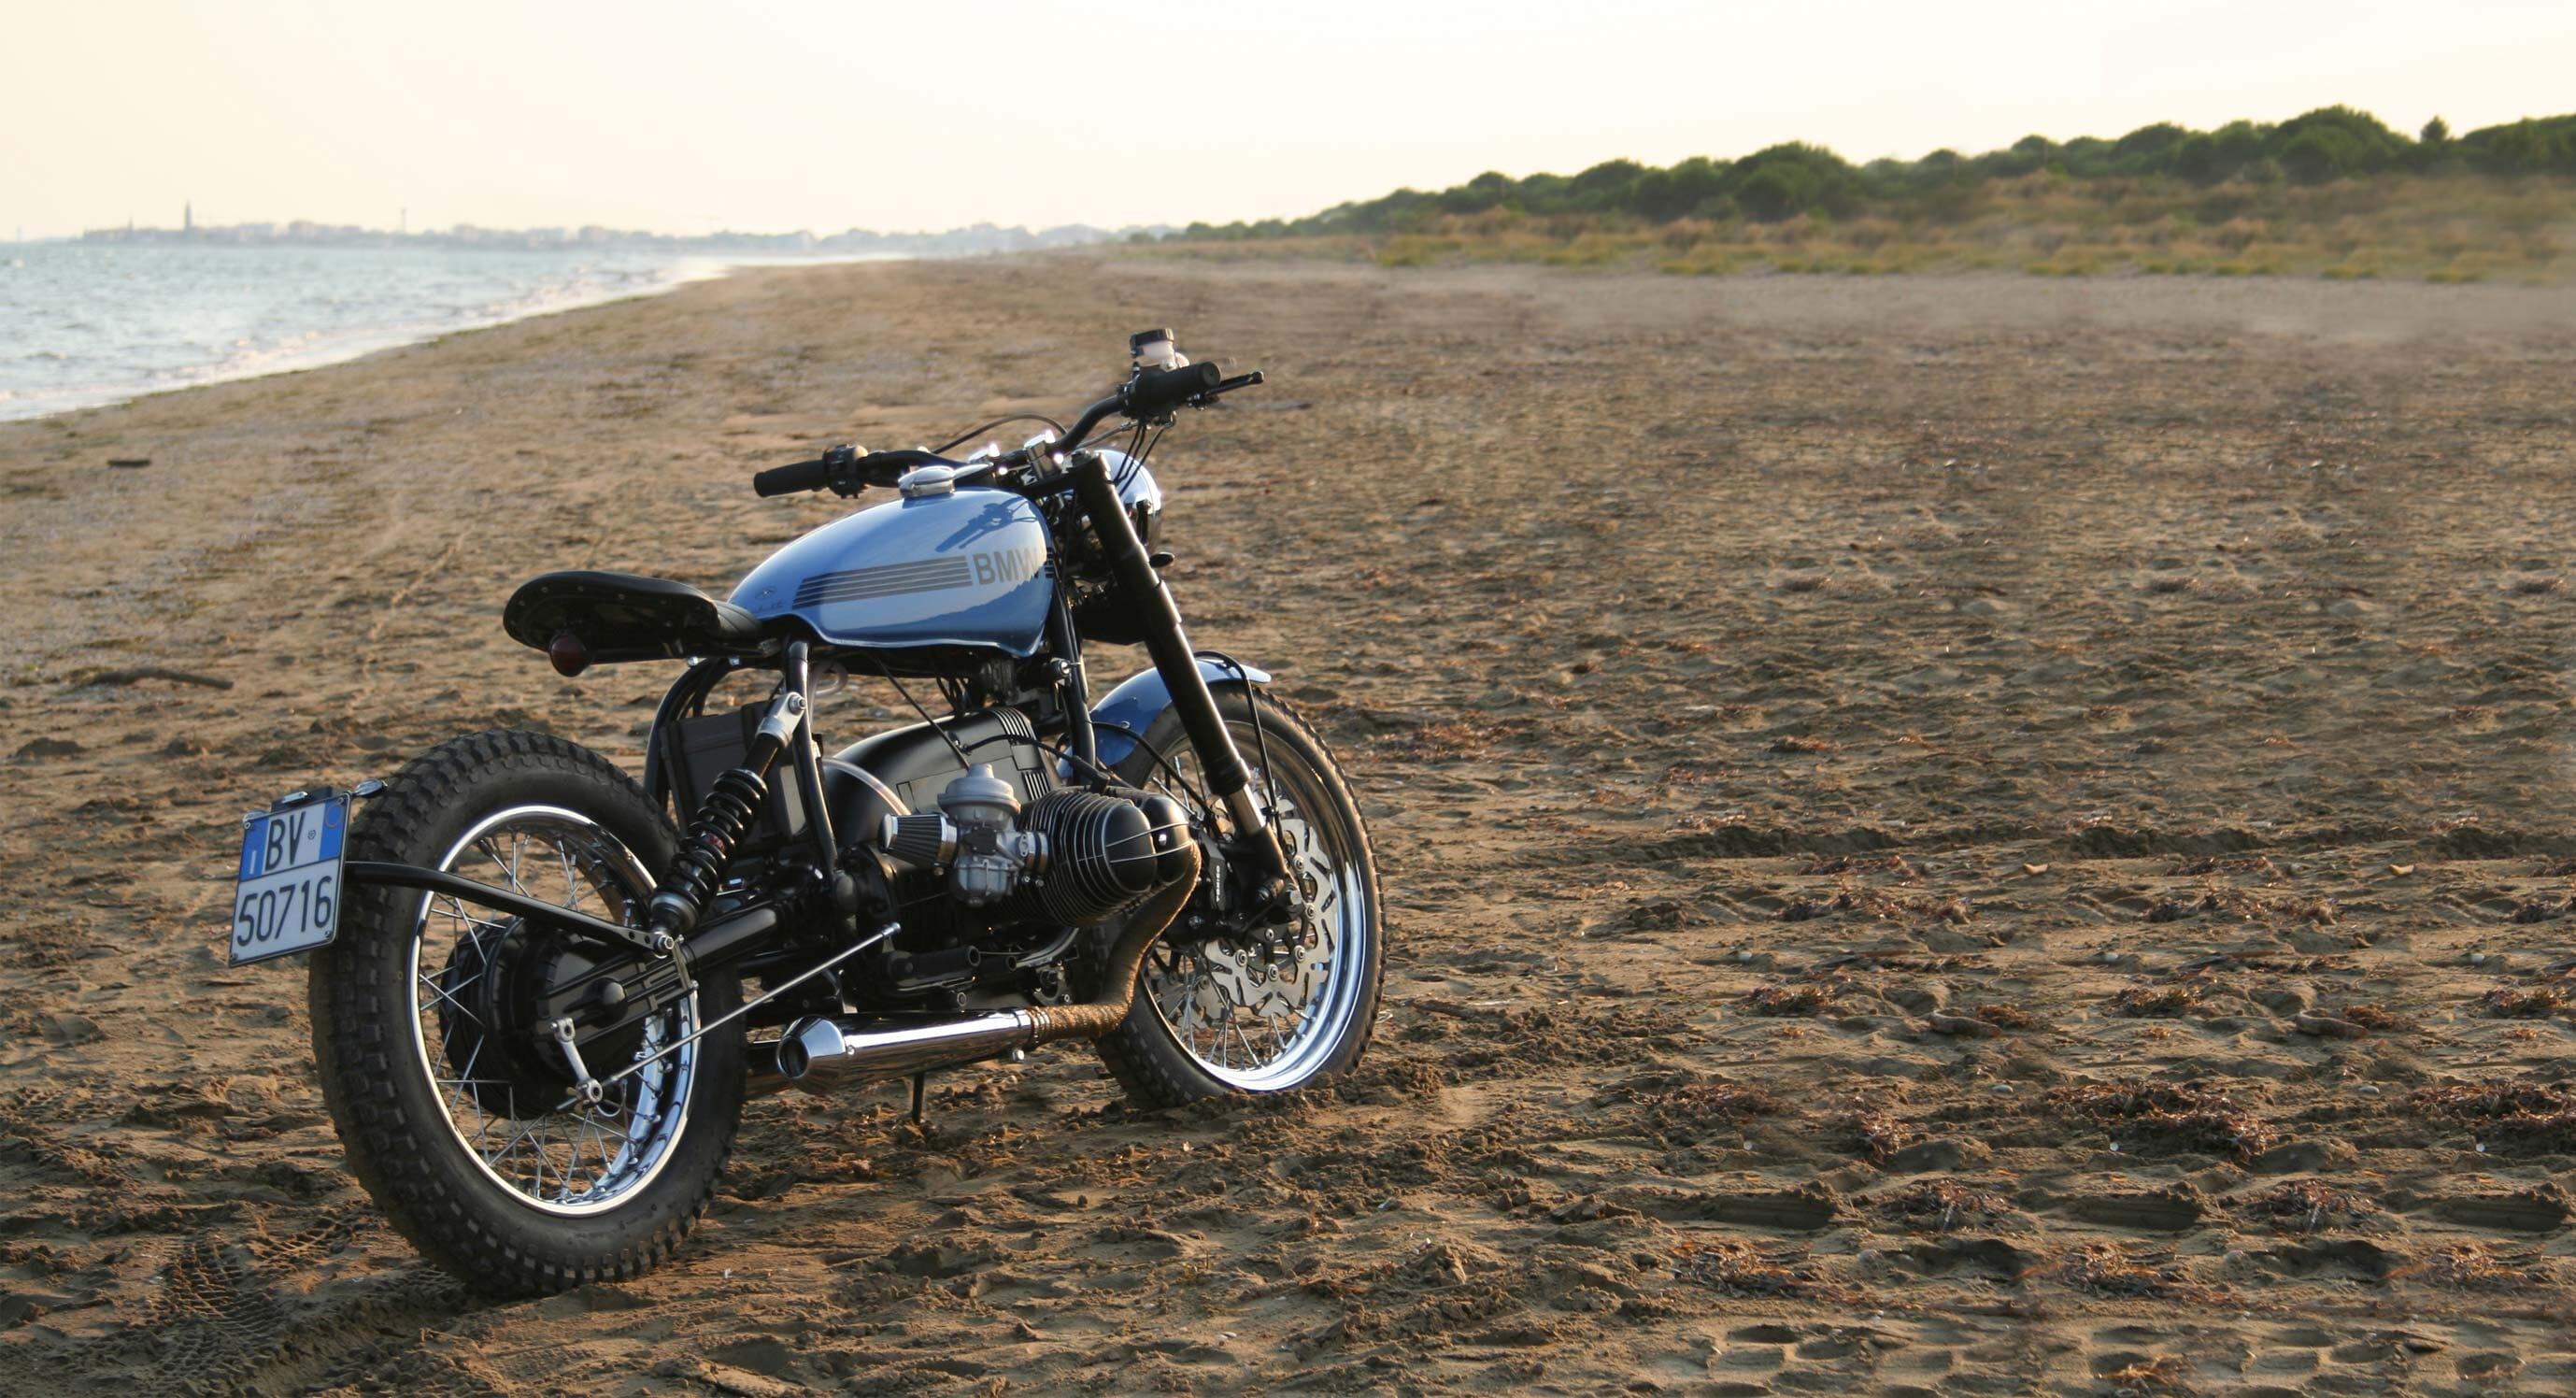 La Motocicletta BMW R80ST: The golden ratio